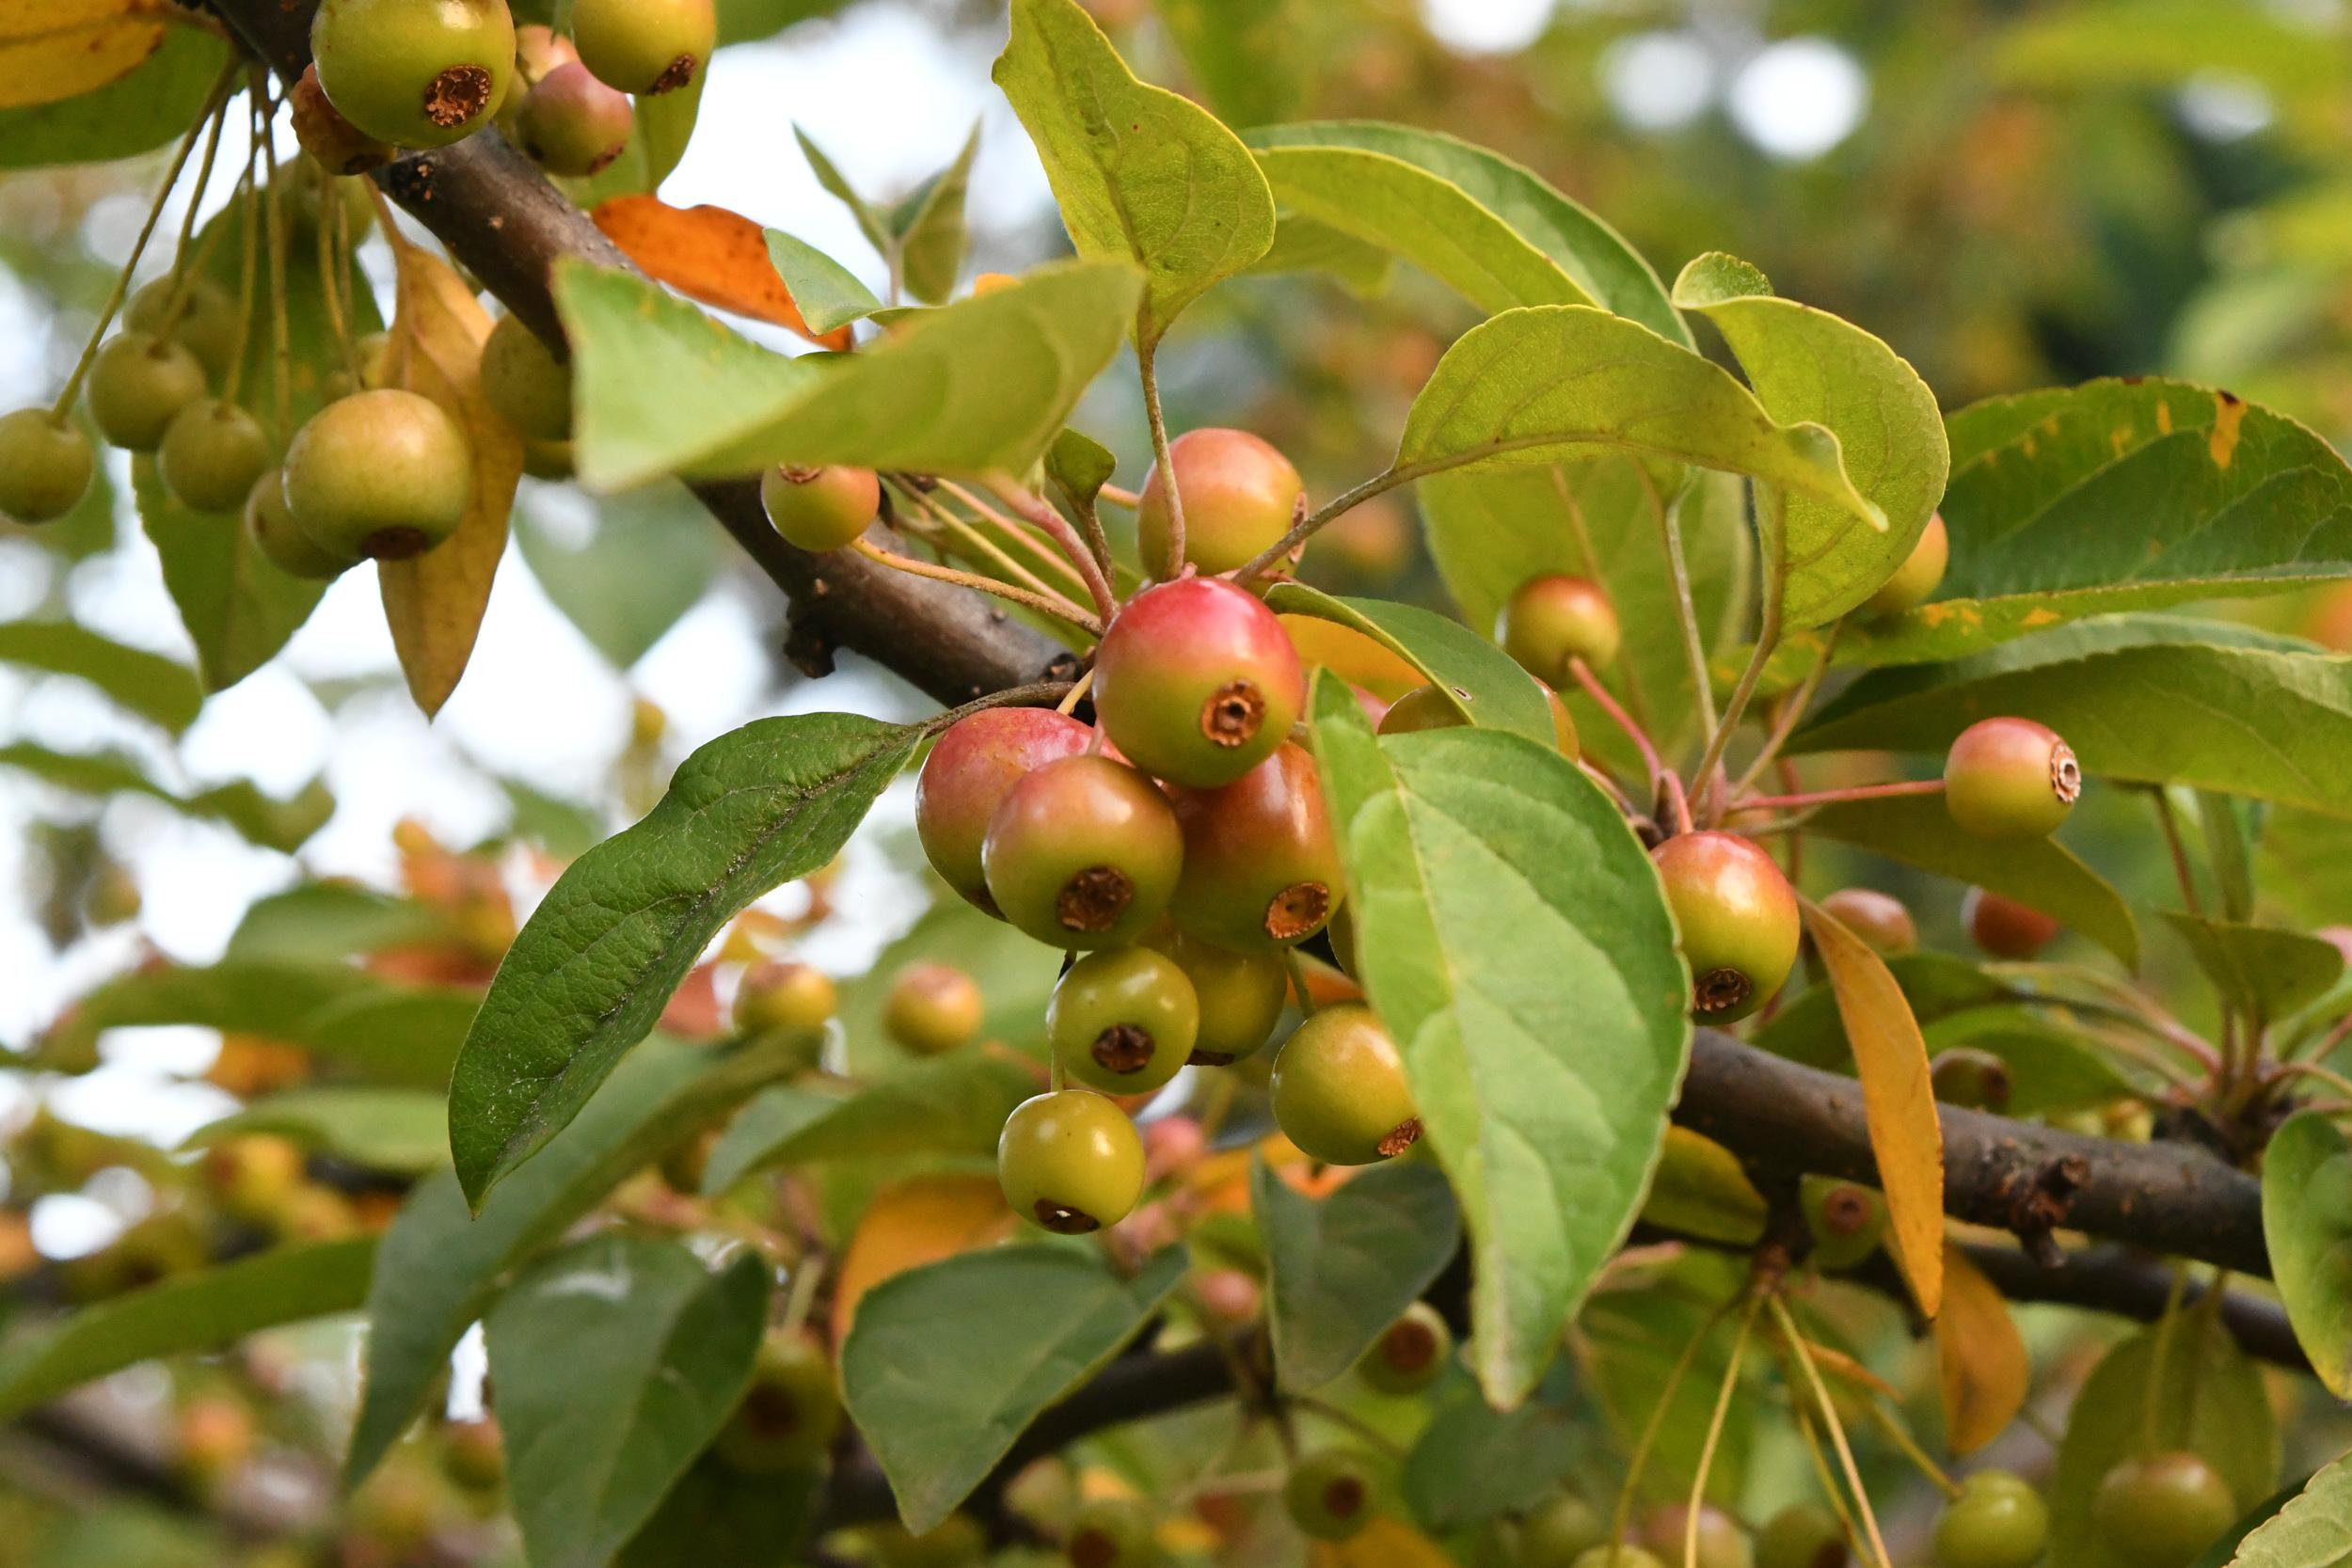 Pin cherry, Prospect Park